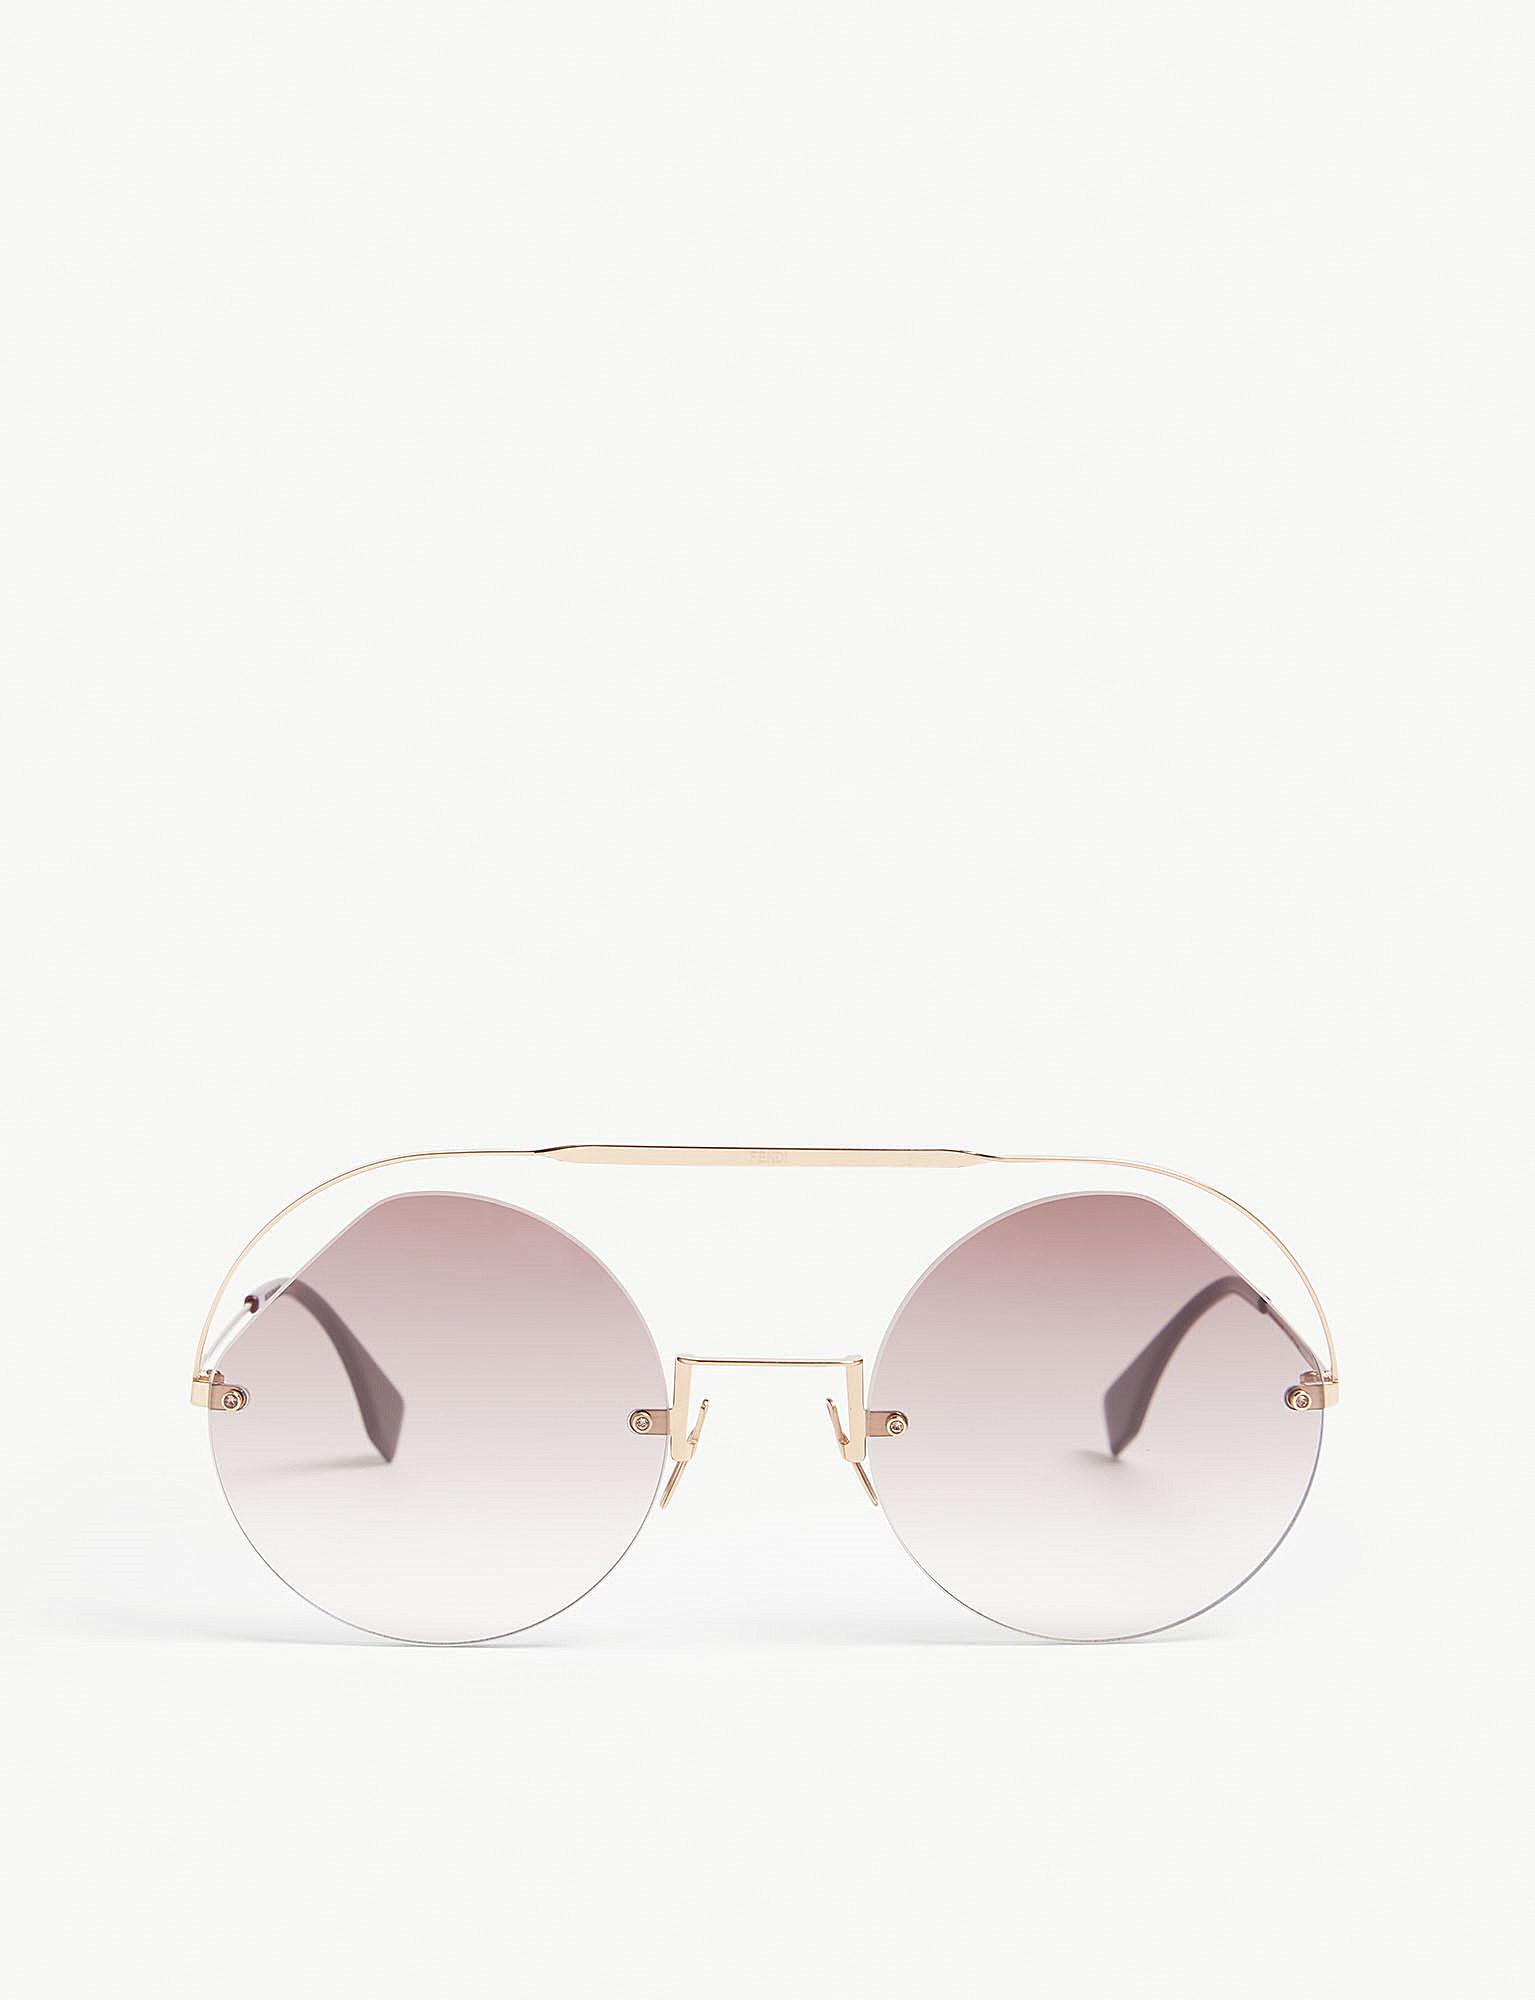 b5b02b9bc2 Lyst - Fendi Ff0325 s Round-frame Sunglasses in Metallic